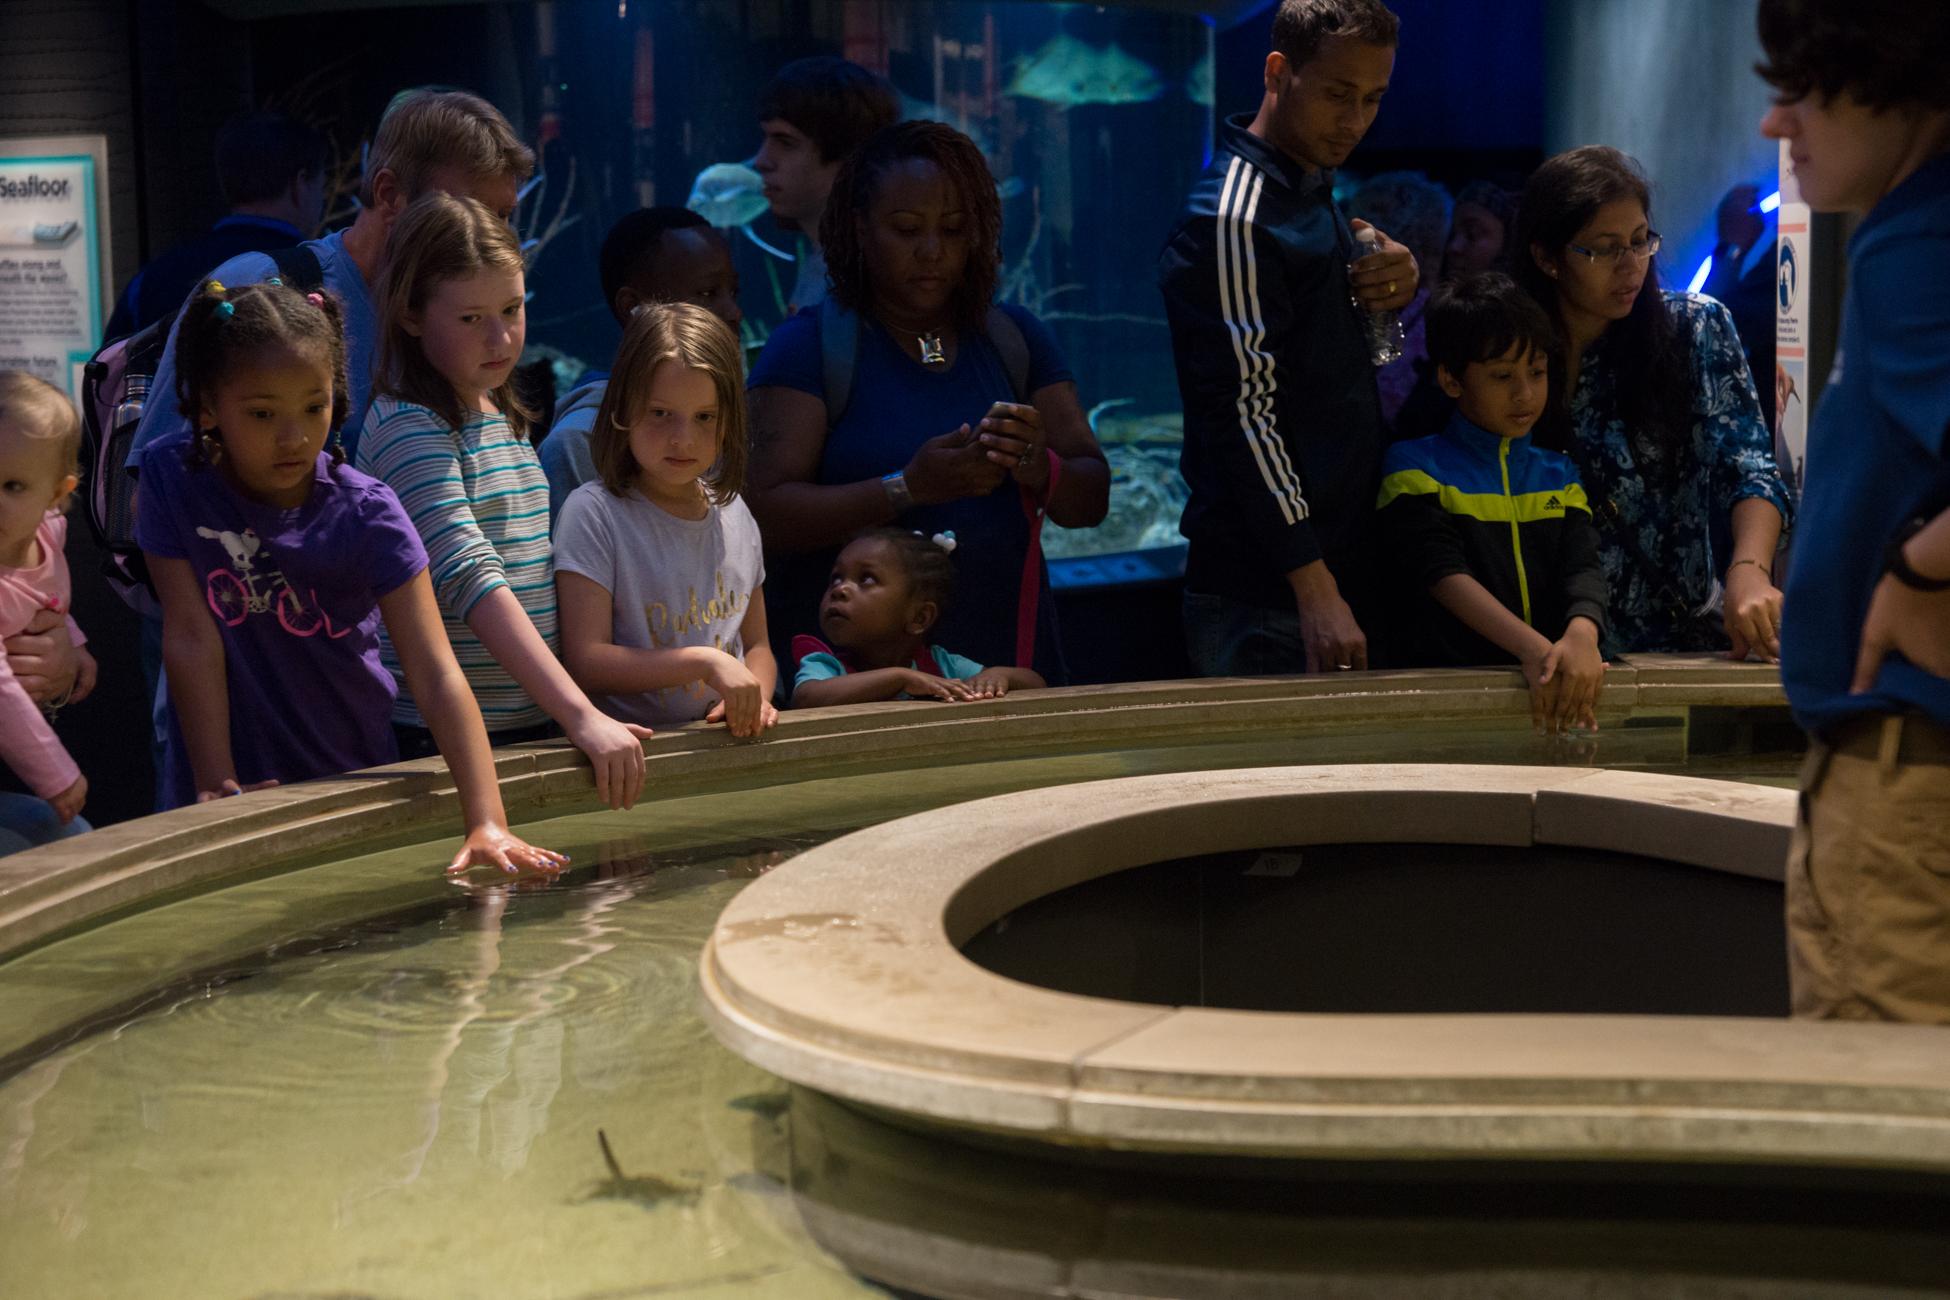 Baltimore Inner Harbor and National Aquarium (c) My3GirlsPhotography May 2017-21.jpg